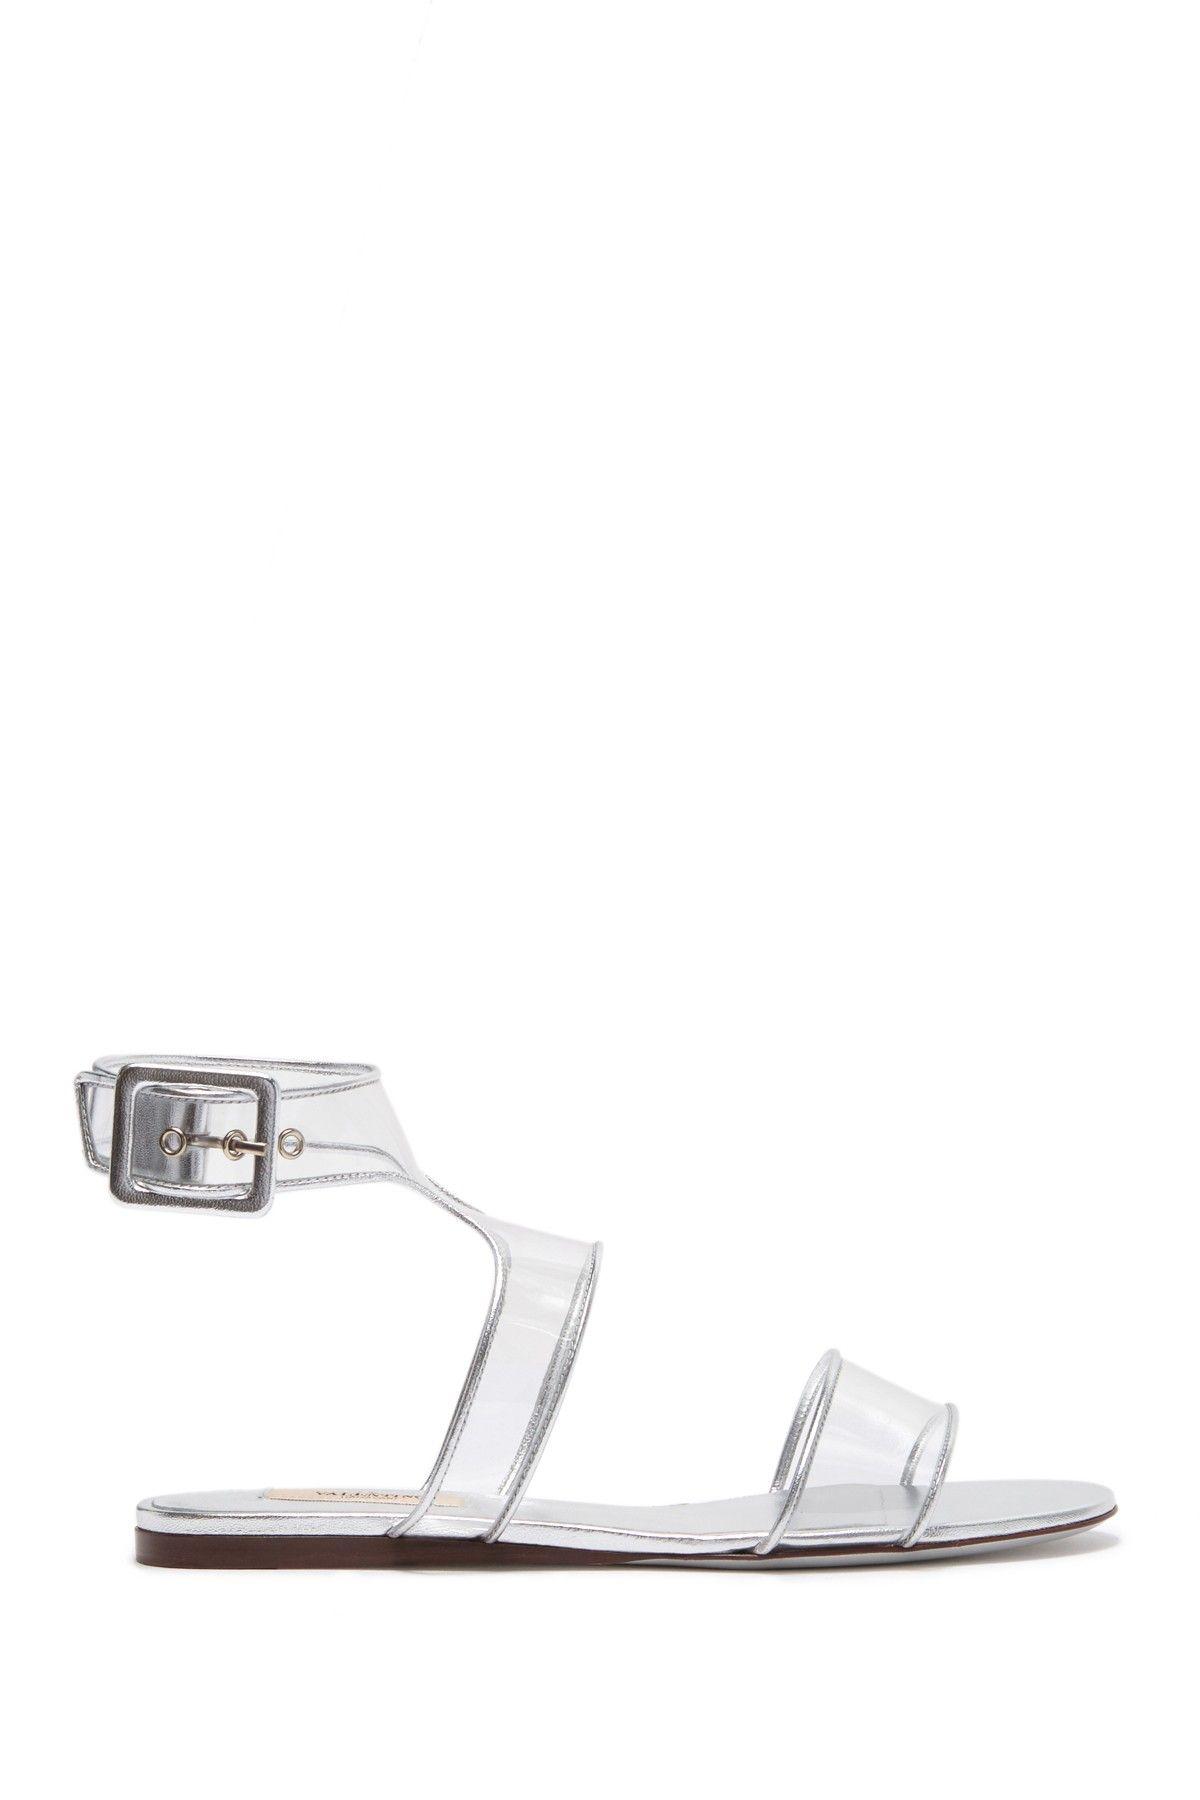 clear sandal nordstrom rack